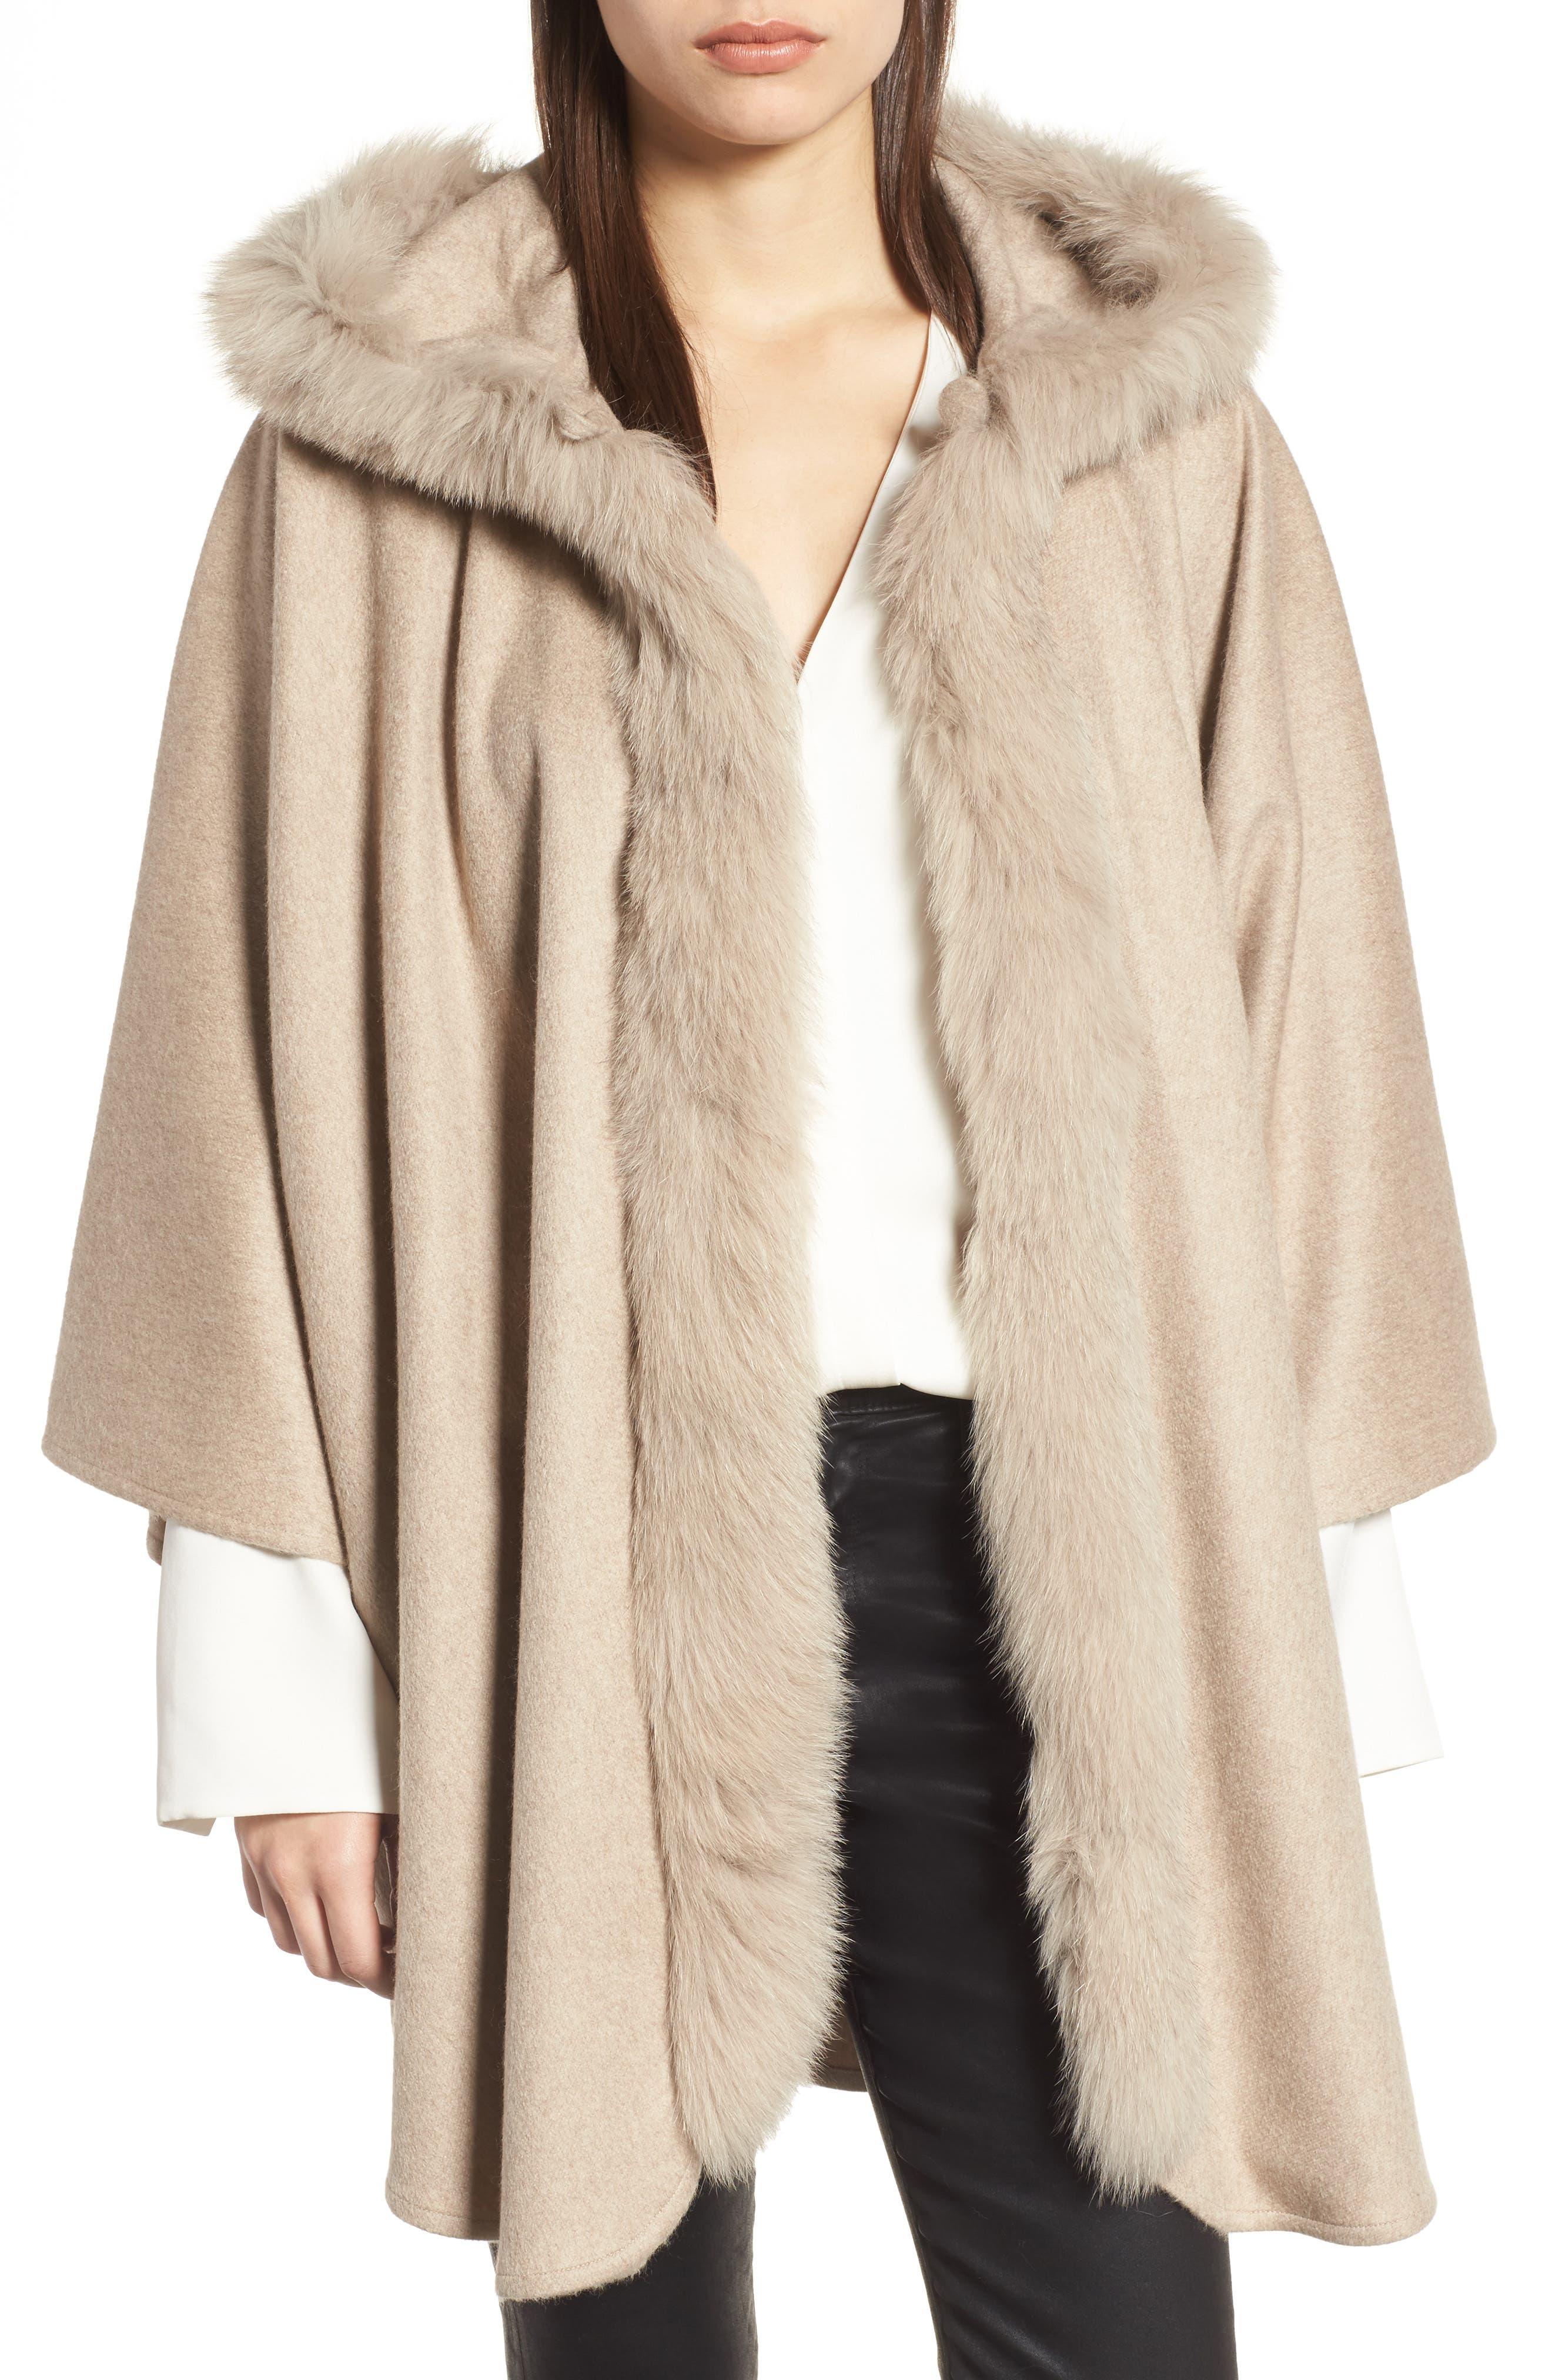 Max Mara Cashmere Hooded Cape with Genuine Fox Fur Trim